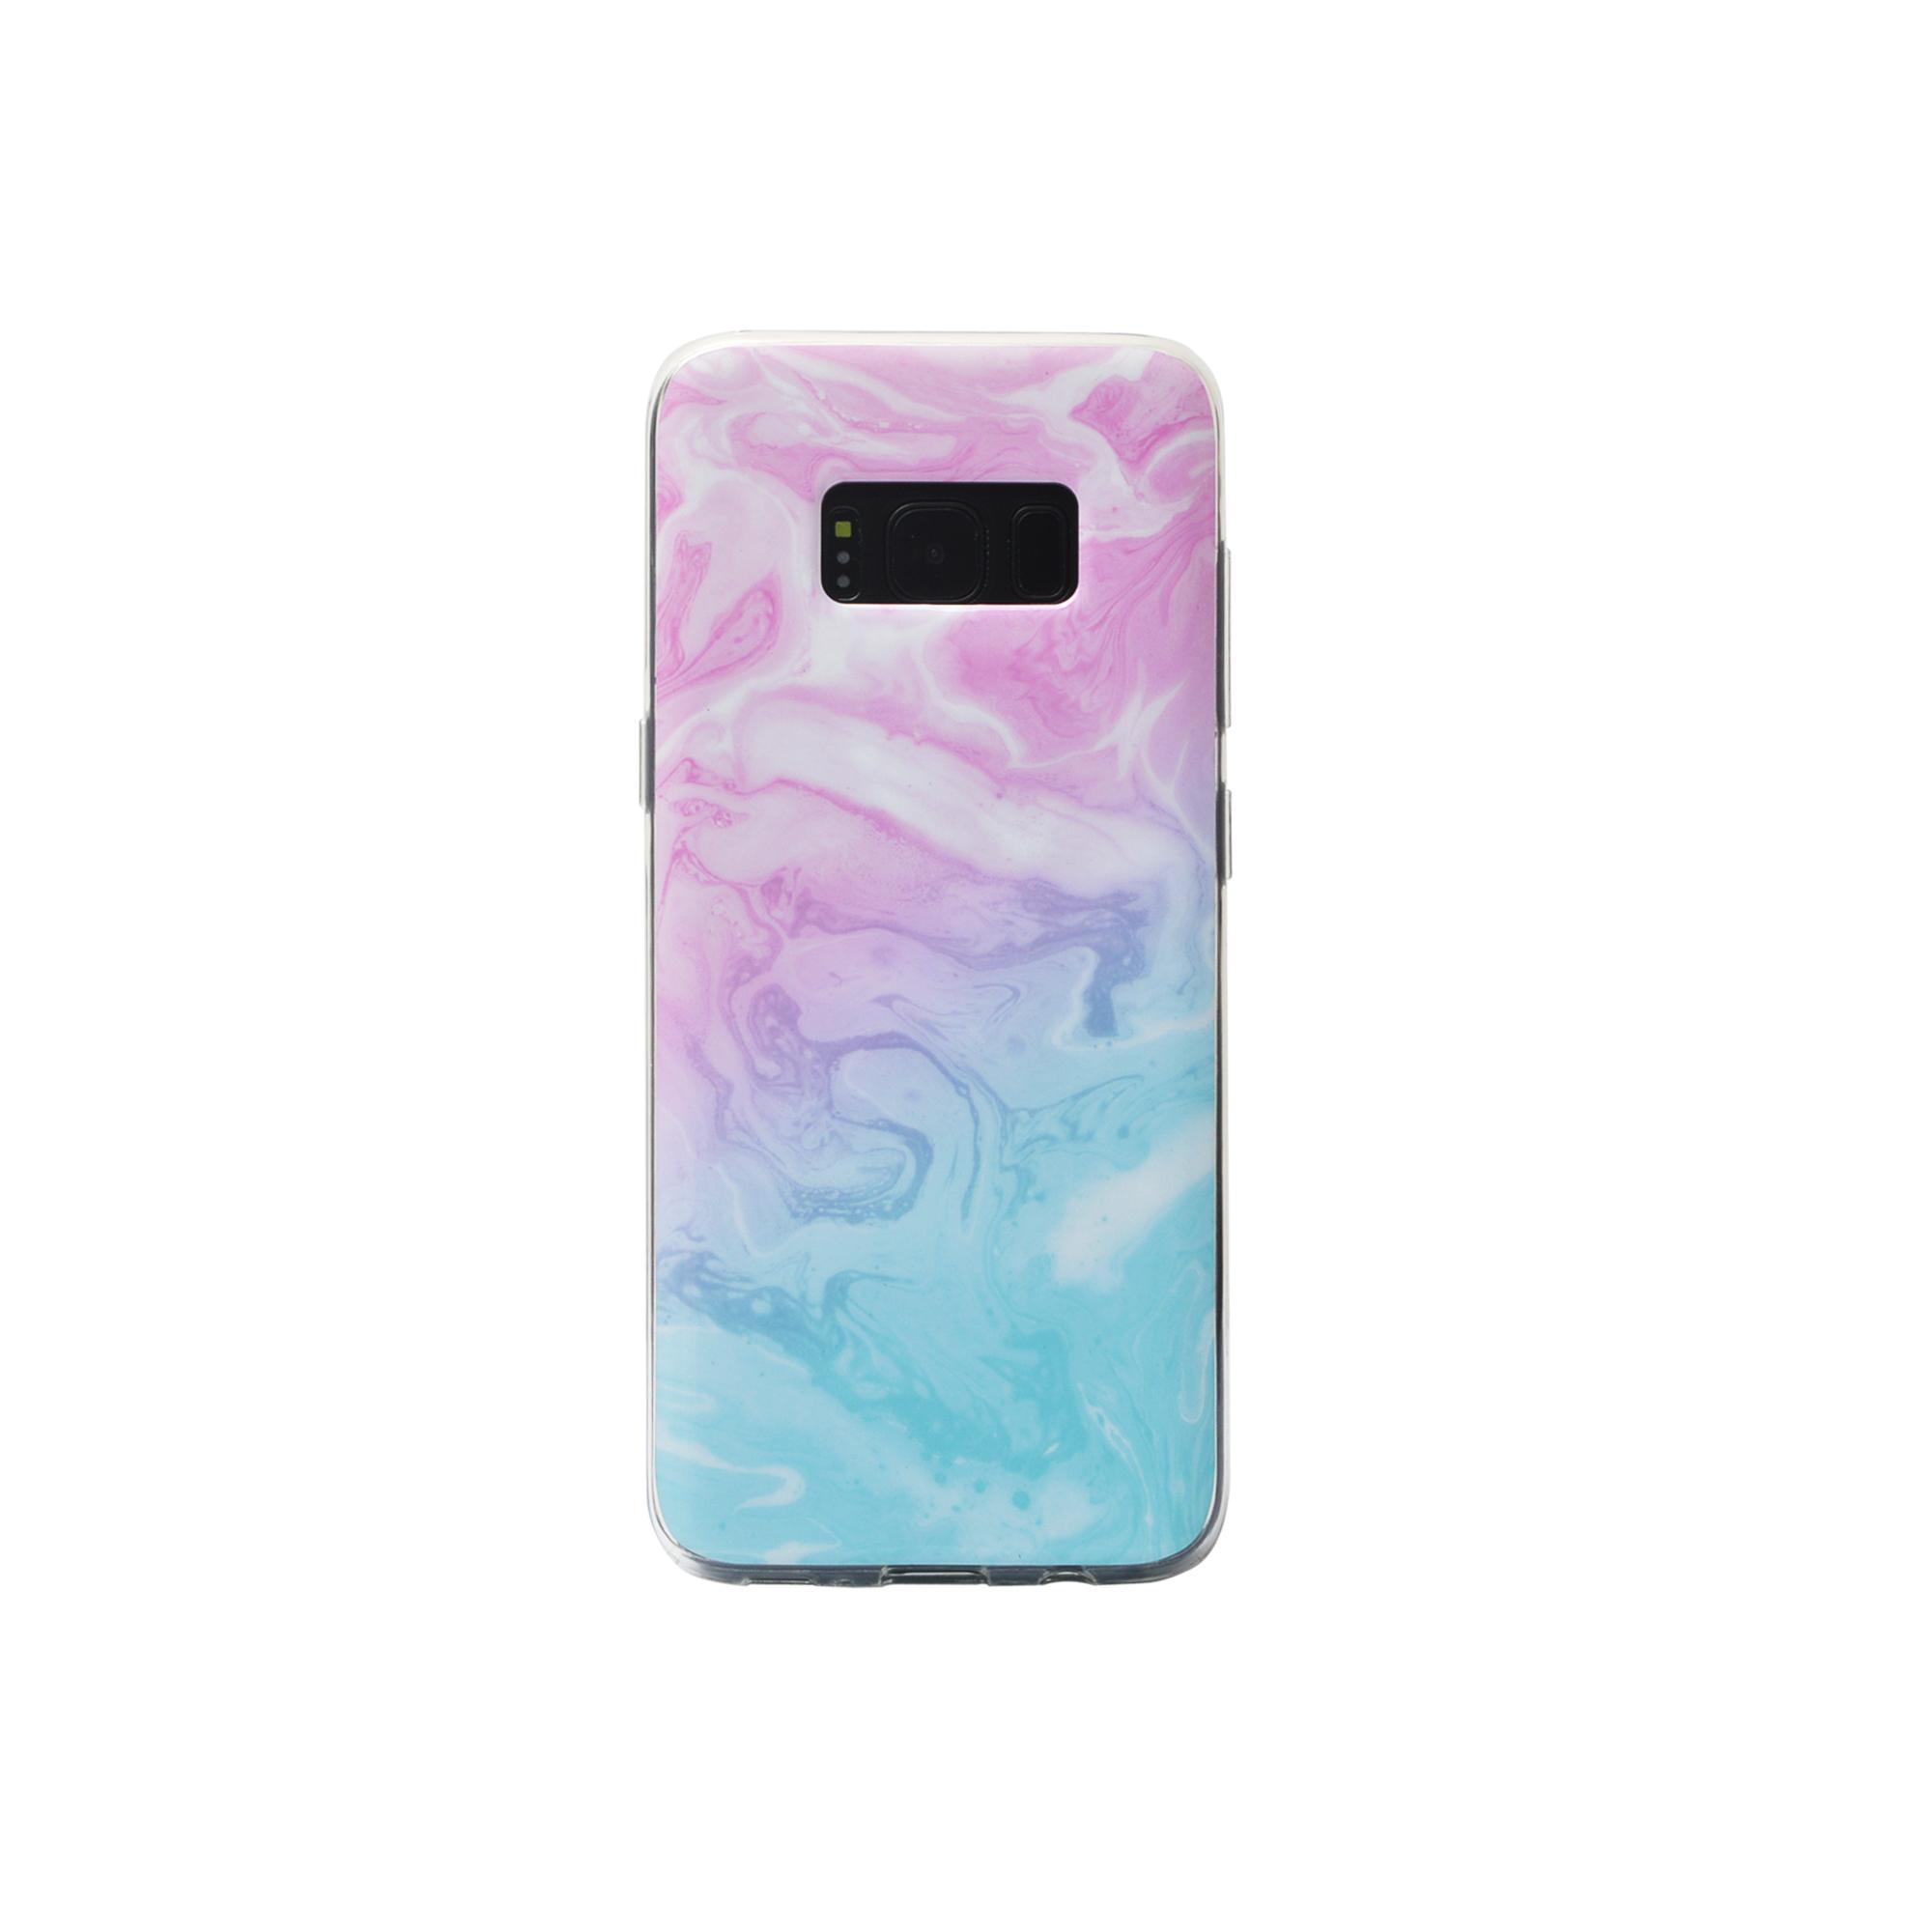 IMD Samsung Galaxy S8 Glossy Soft Marble TPU Case 2